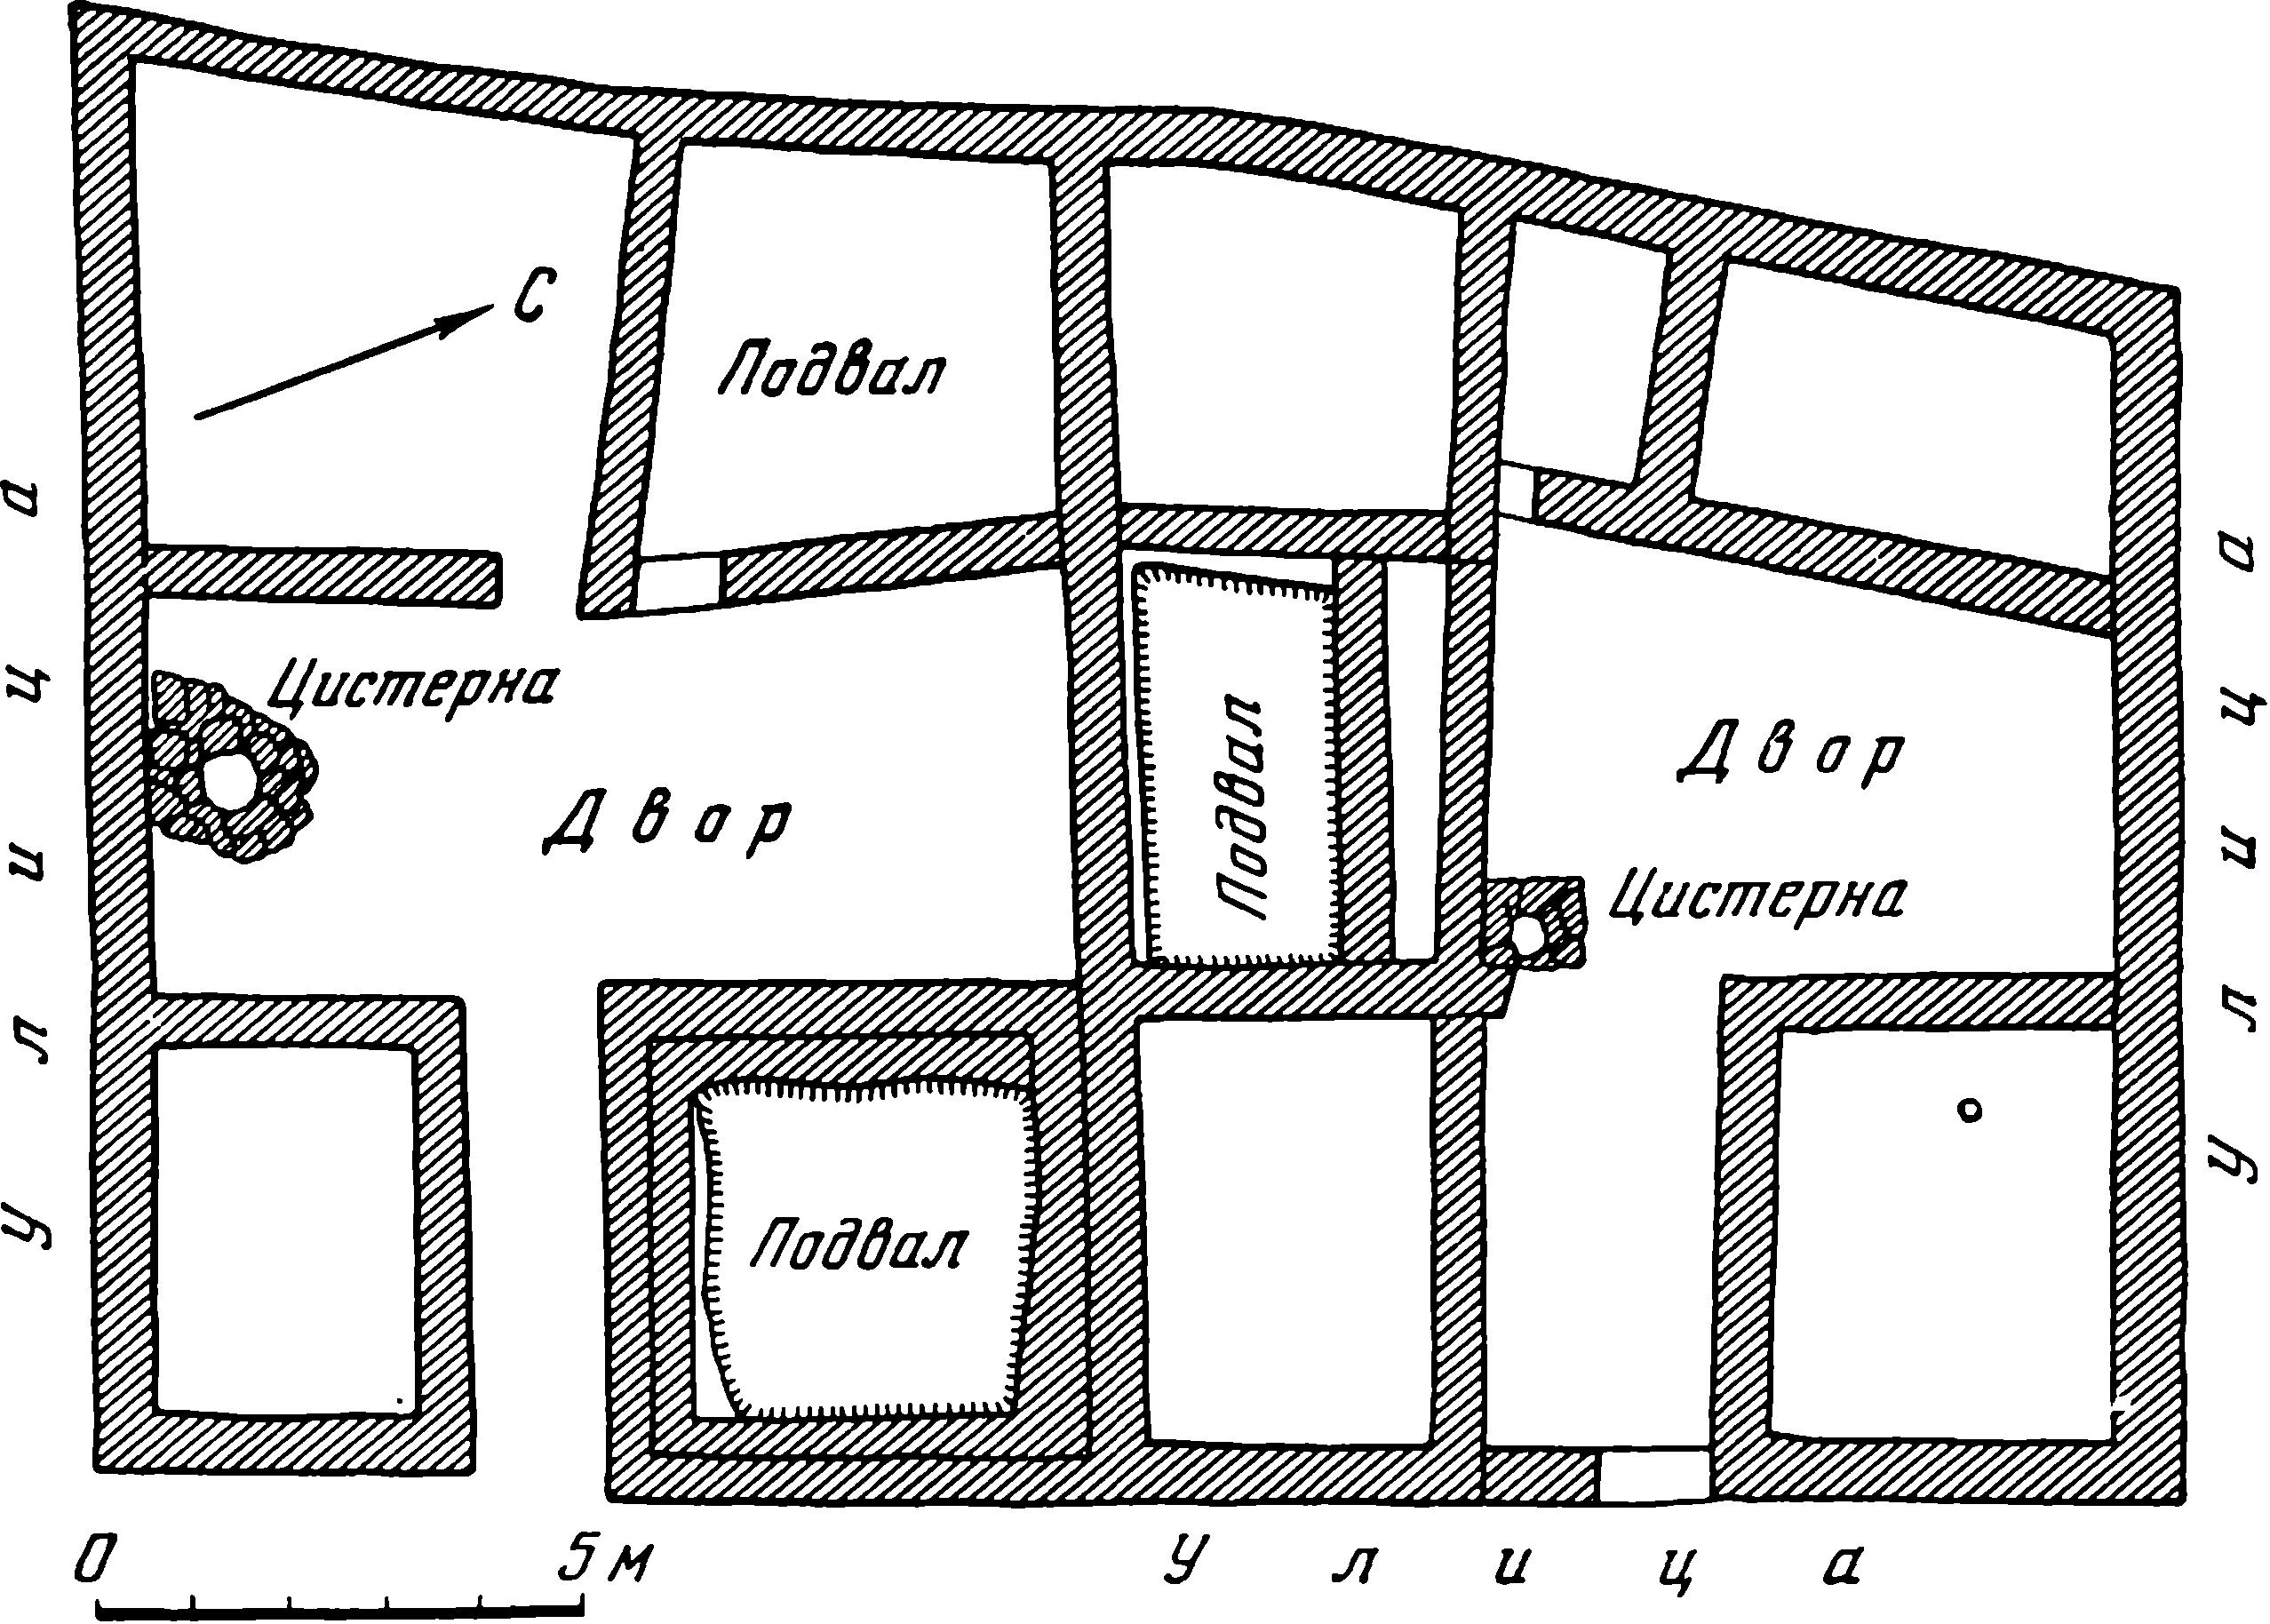 ap-36